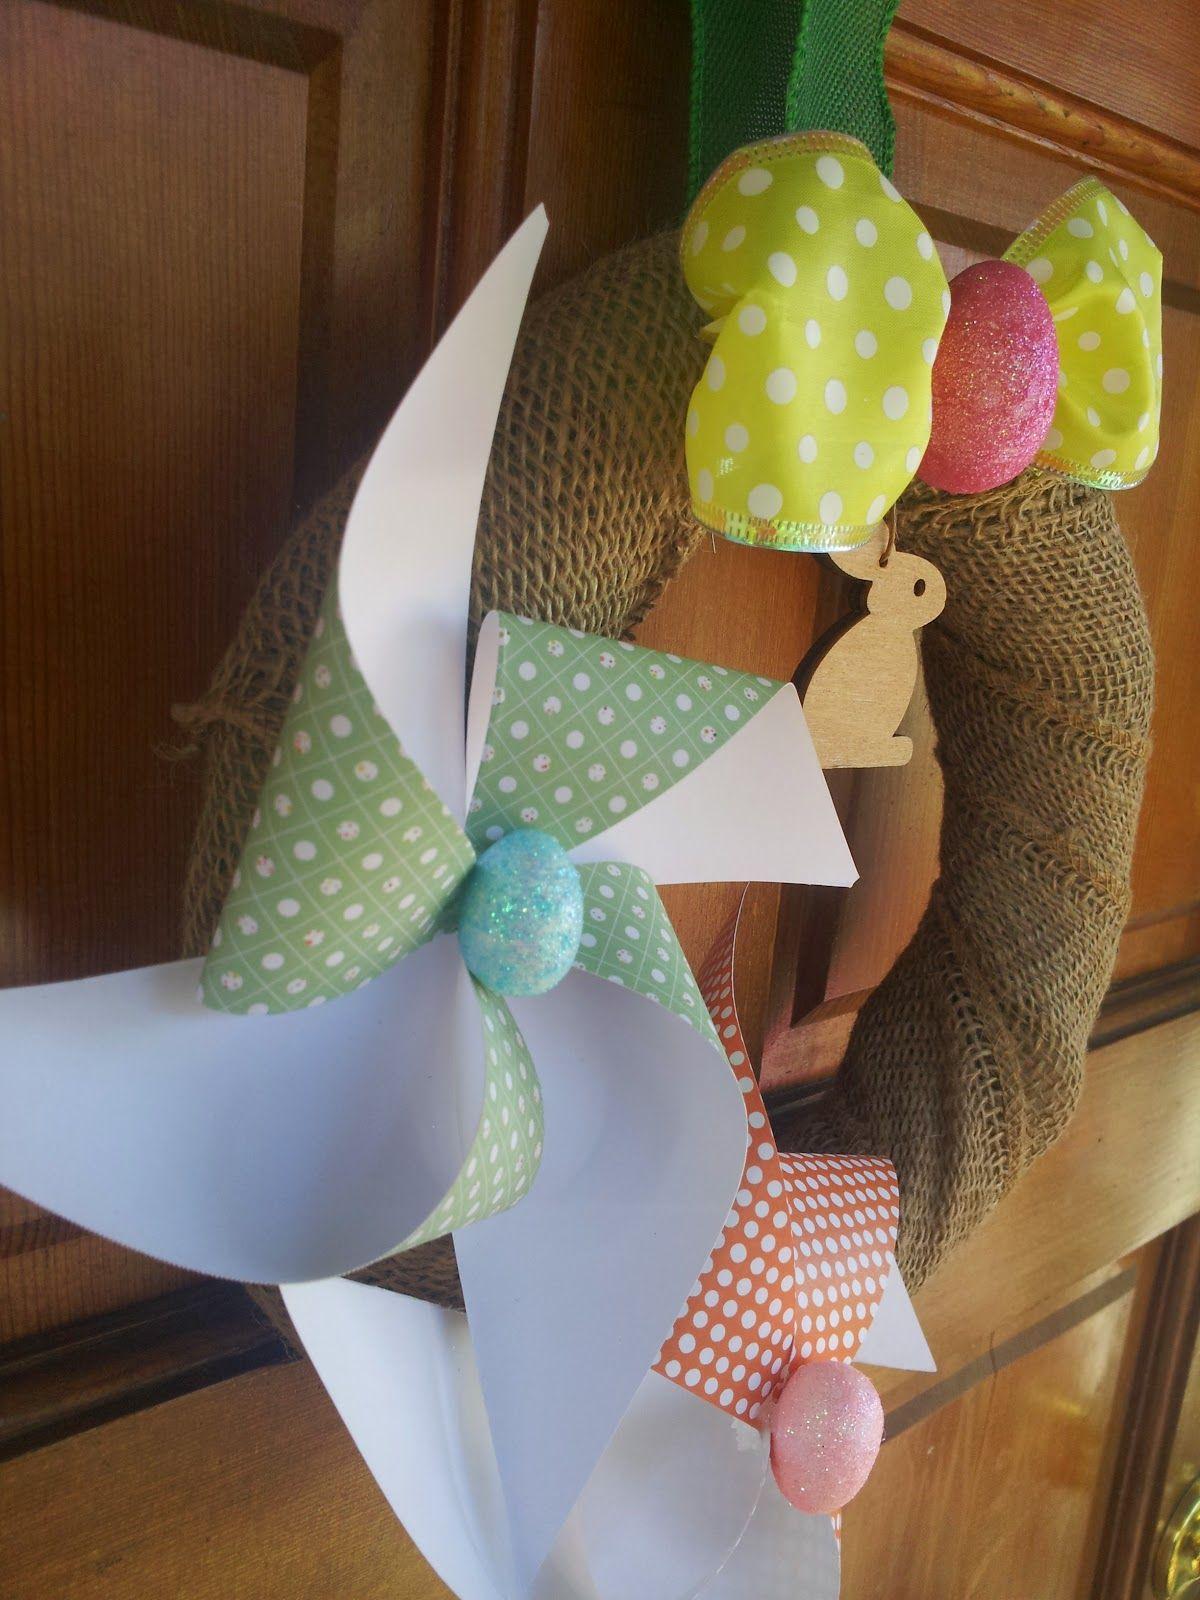 Easter wreath paper crafts diy dollar store crafts crafts